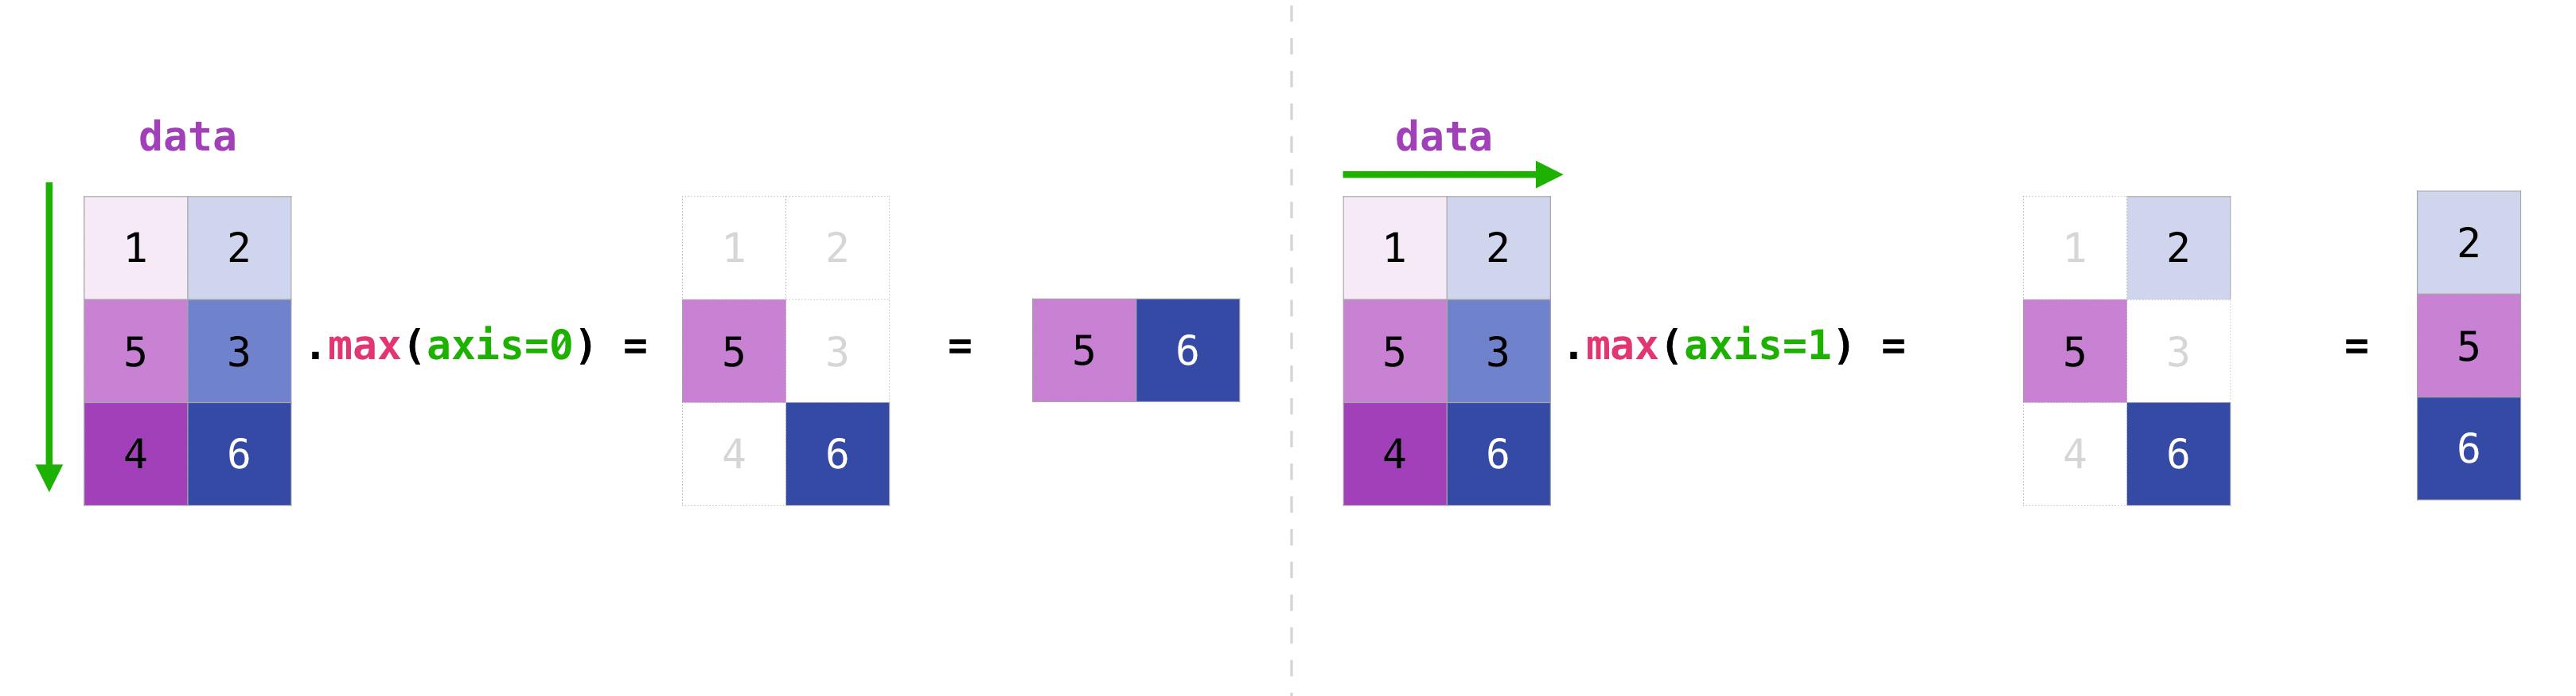 ../_images/np_matrix_aggregation_row.png